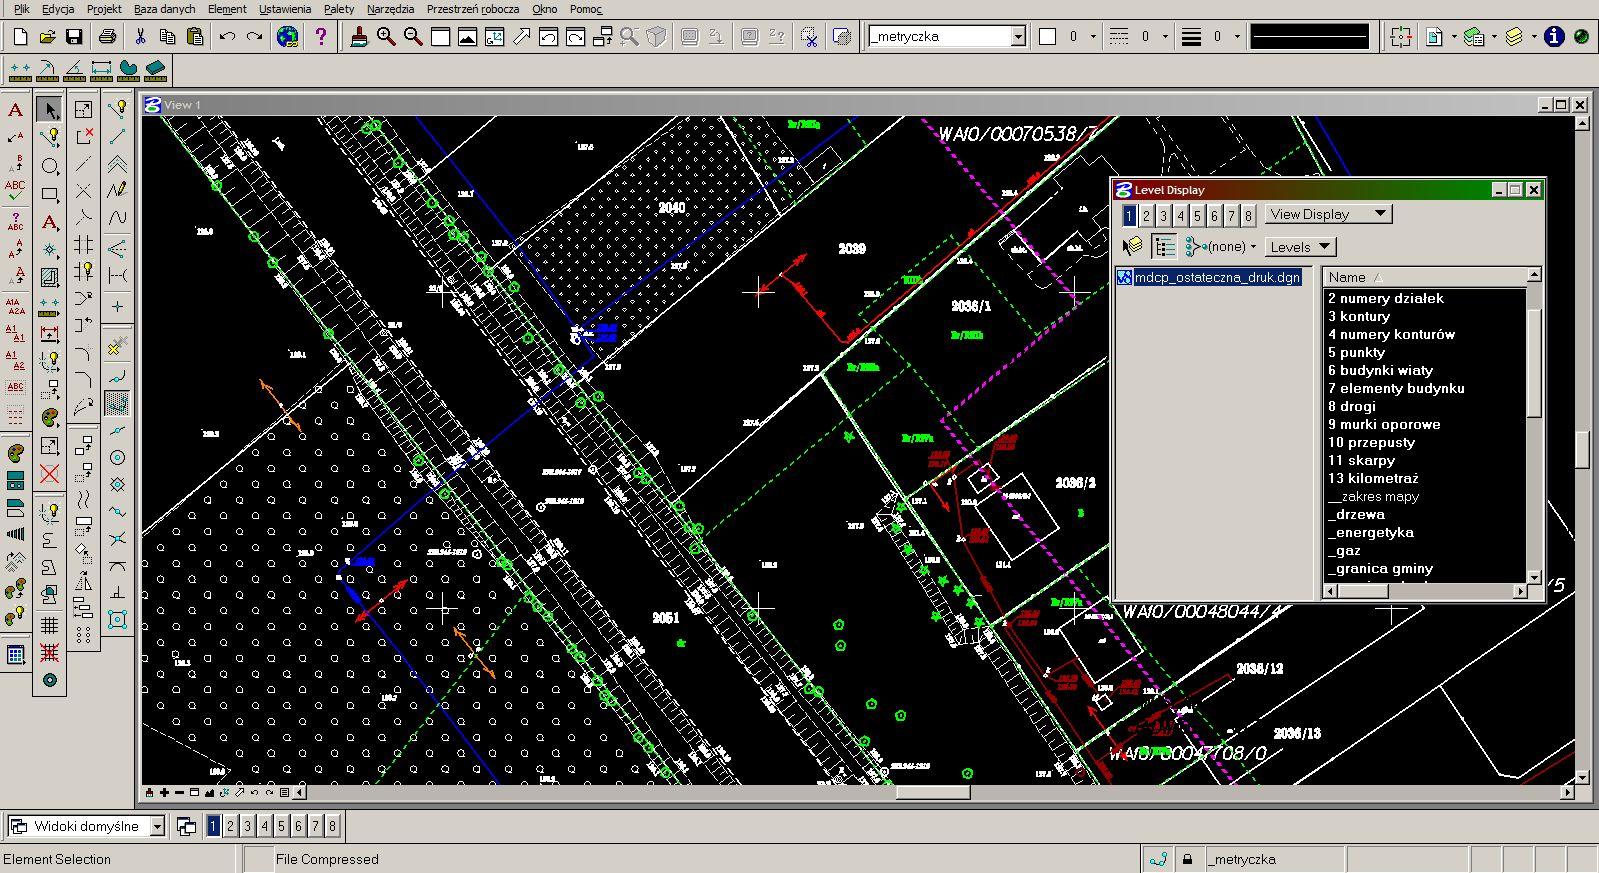 Maps for design purposes